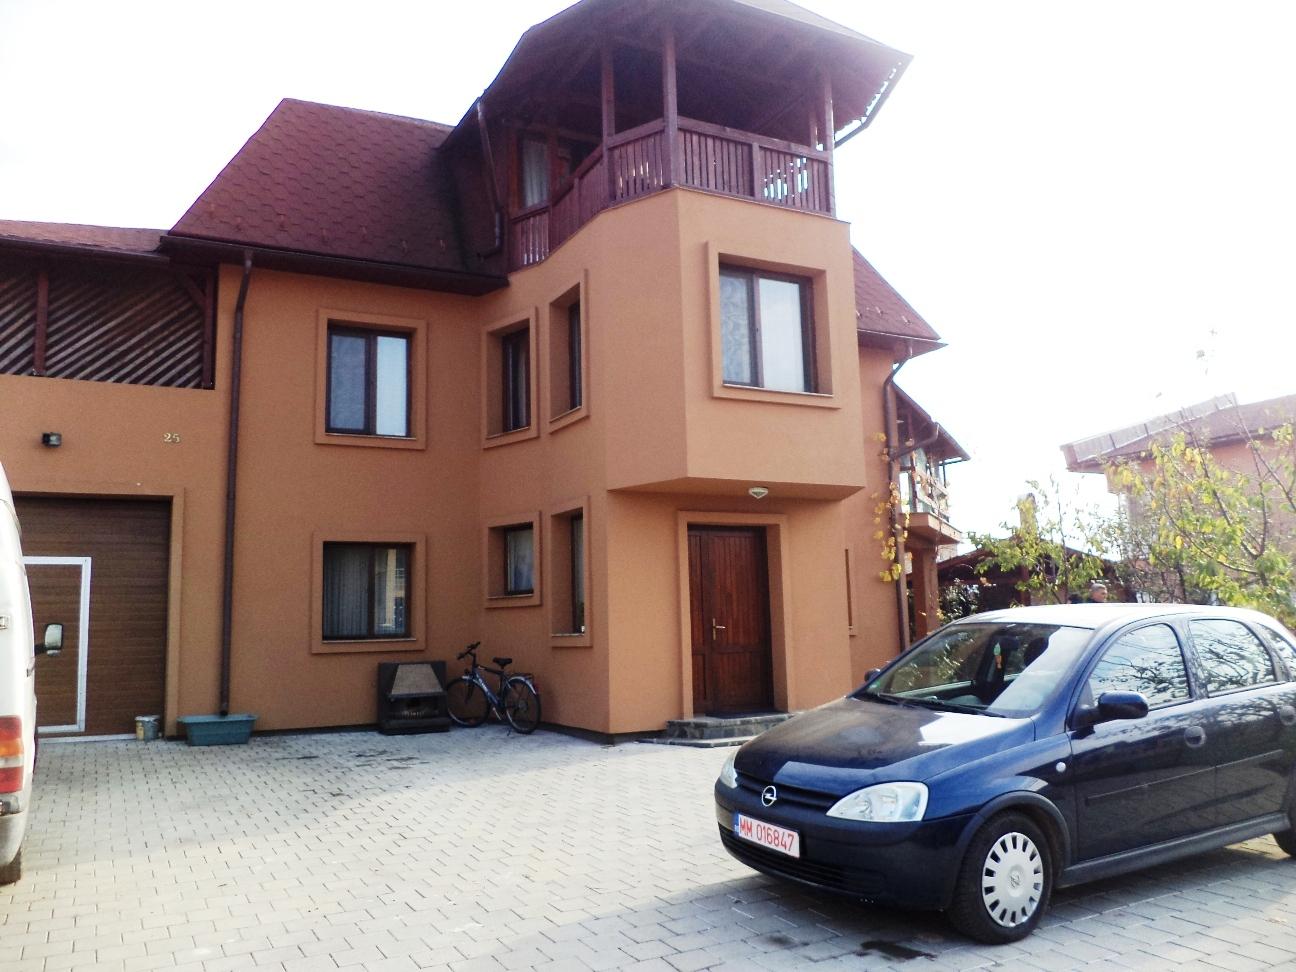 De vanzare Casa noua in Livada Baia Mare – zona foarte buna !